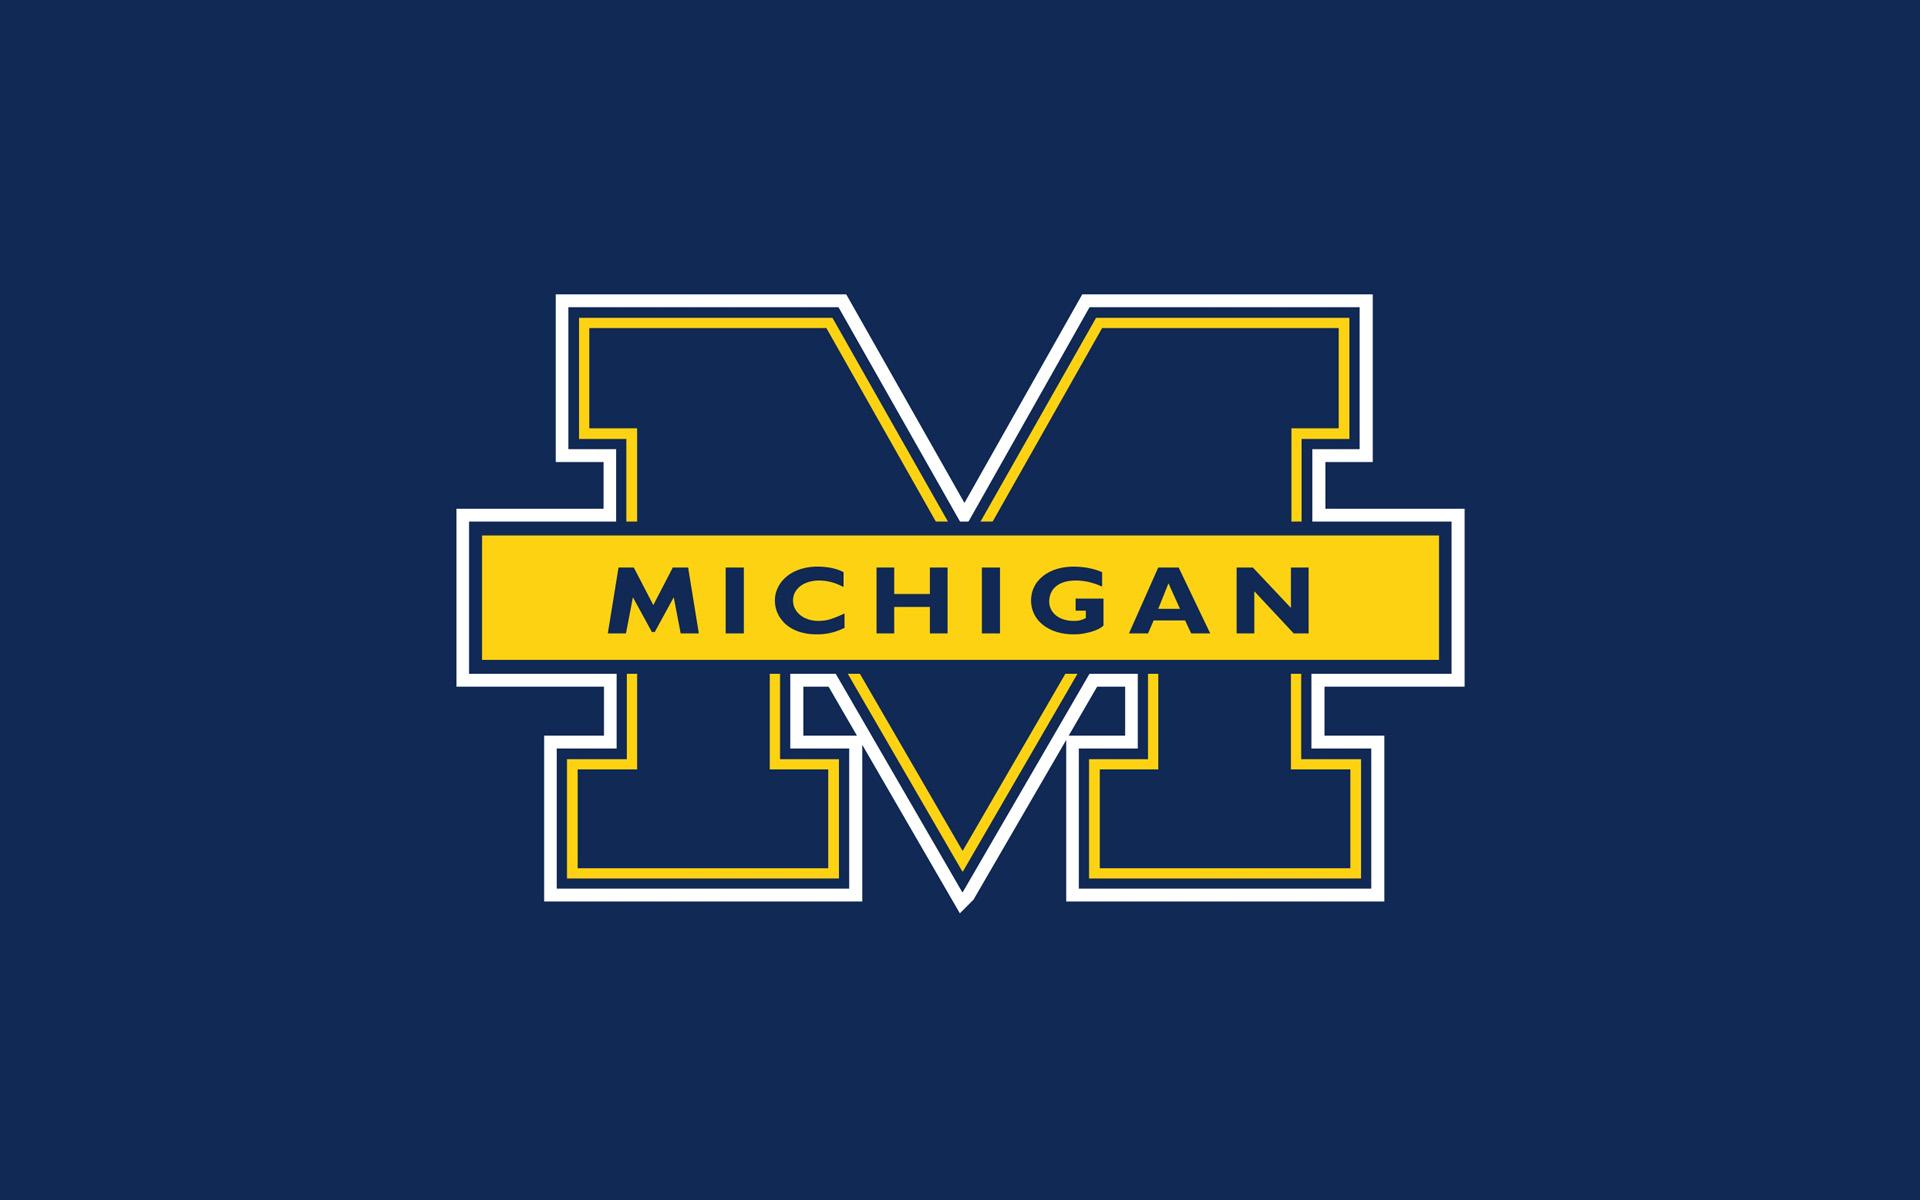 University Blue Logo Michigan wallpaper 1920x1200 100733 1920x1200